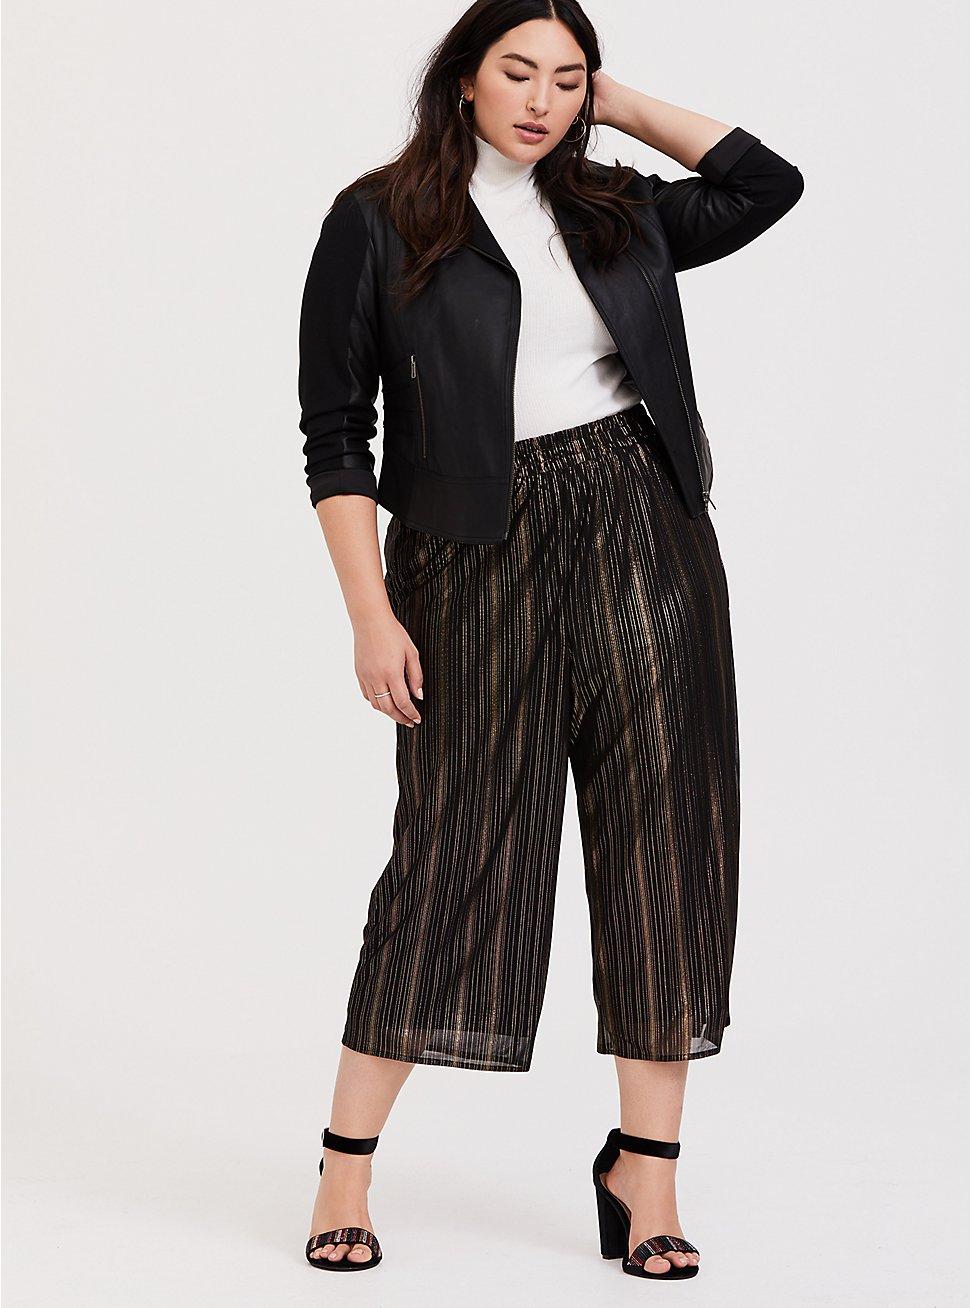 Plus Size Black & Gold Shiny Culotte Pant, DEEP BLACK, hi-res